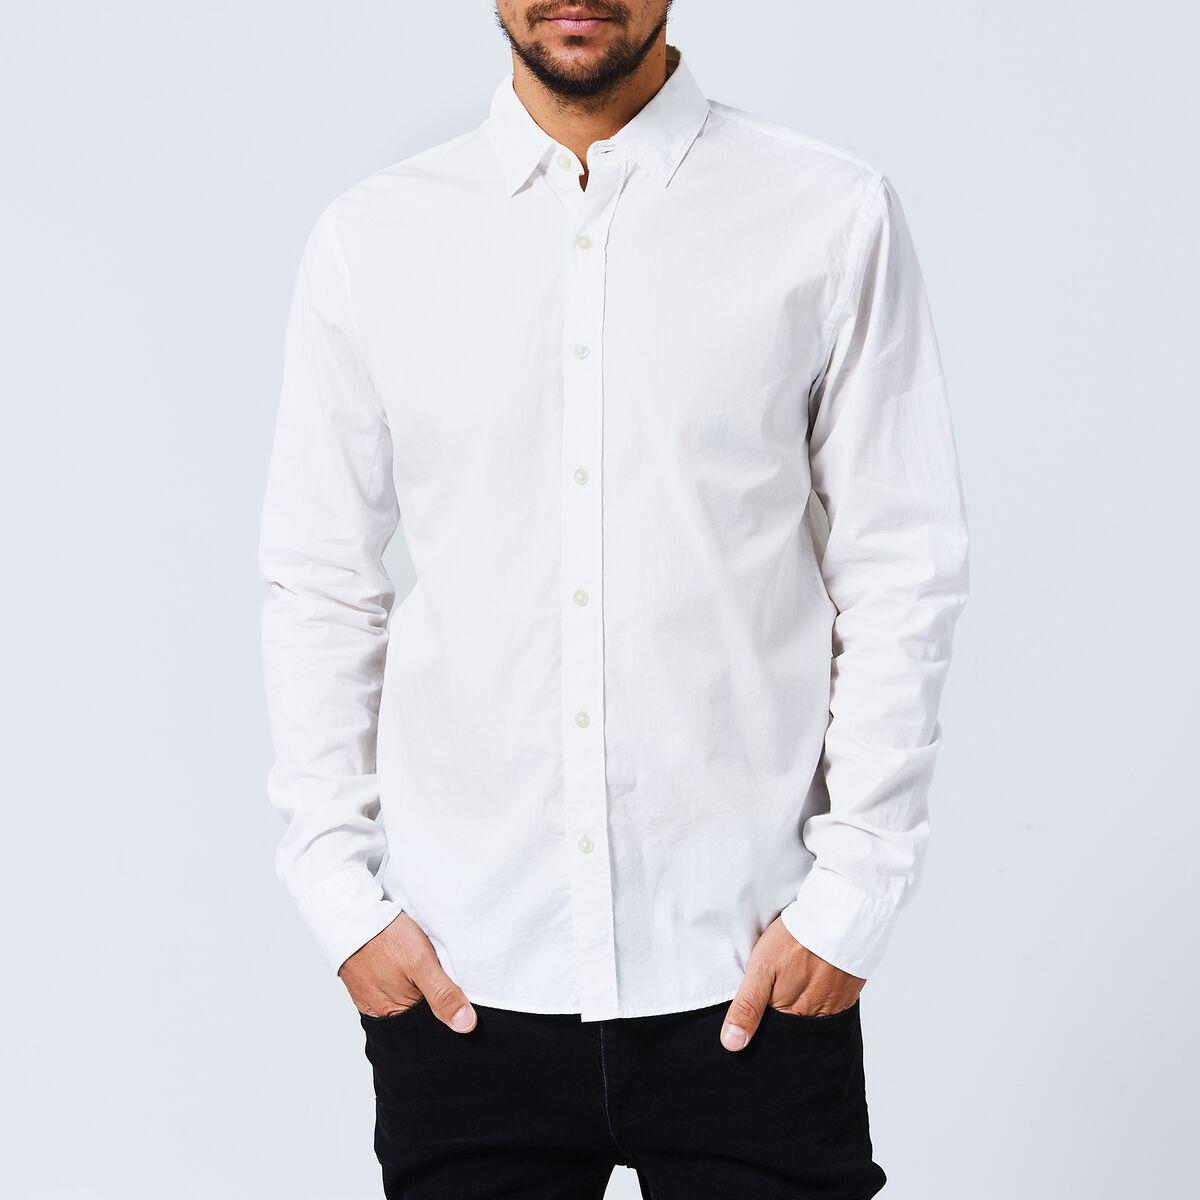 Heren Overhemd Wit.Heren Overhemd Hudson Wit Kopen Online America Today